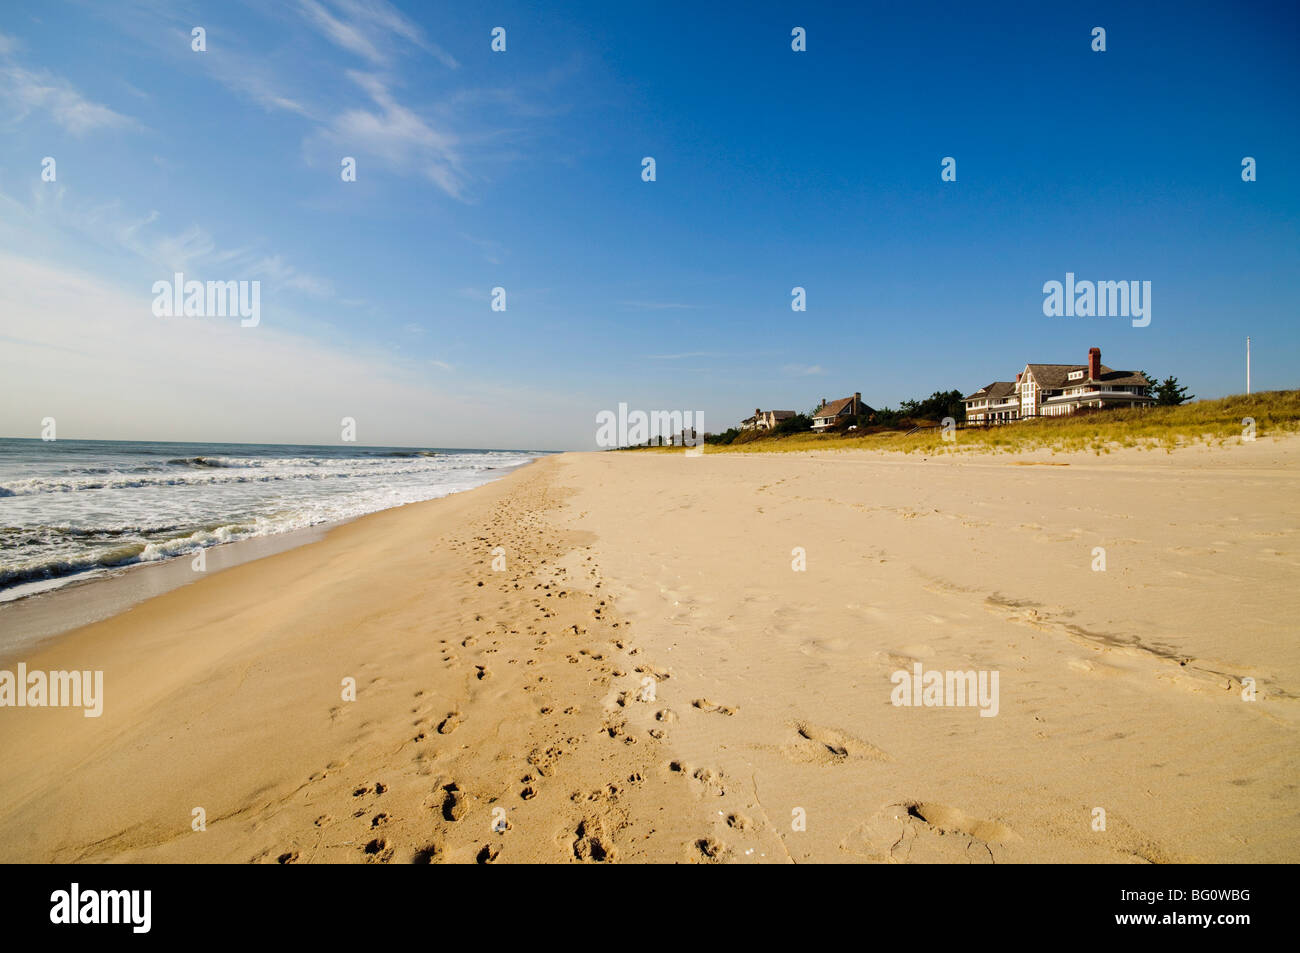 Main Beach, East Hampton, the Hamptons, Long Island, New York State, United States of America, North America - Stock Image